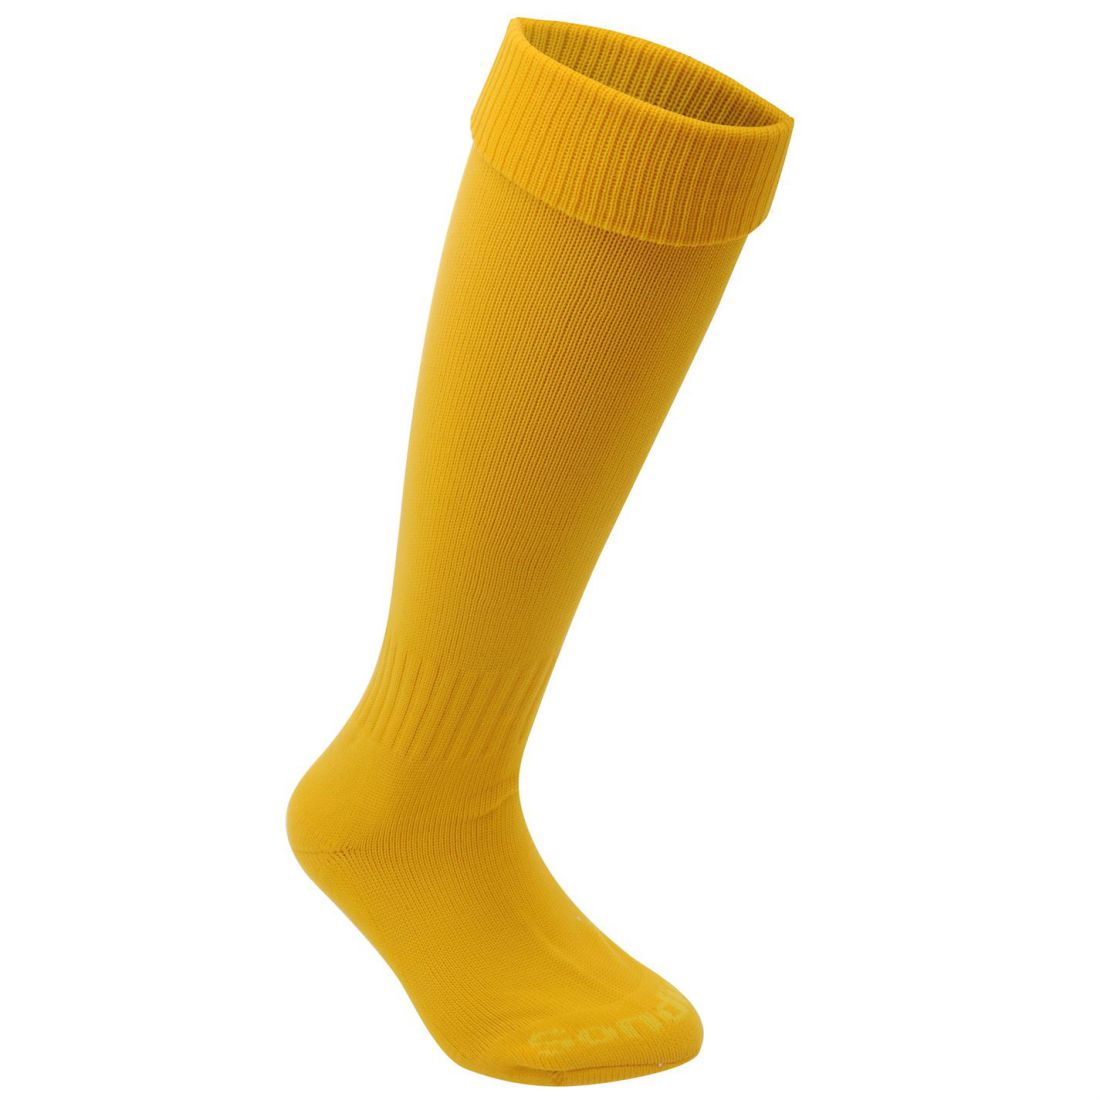 Sondico Football Socks Mens Gents Ventilated